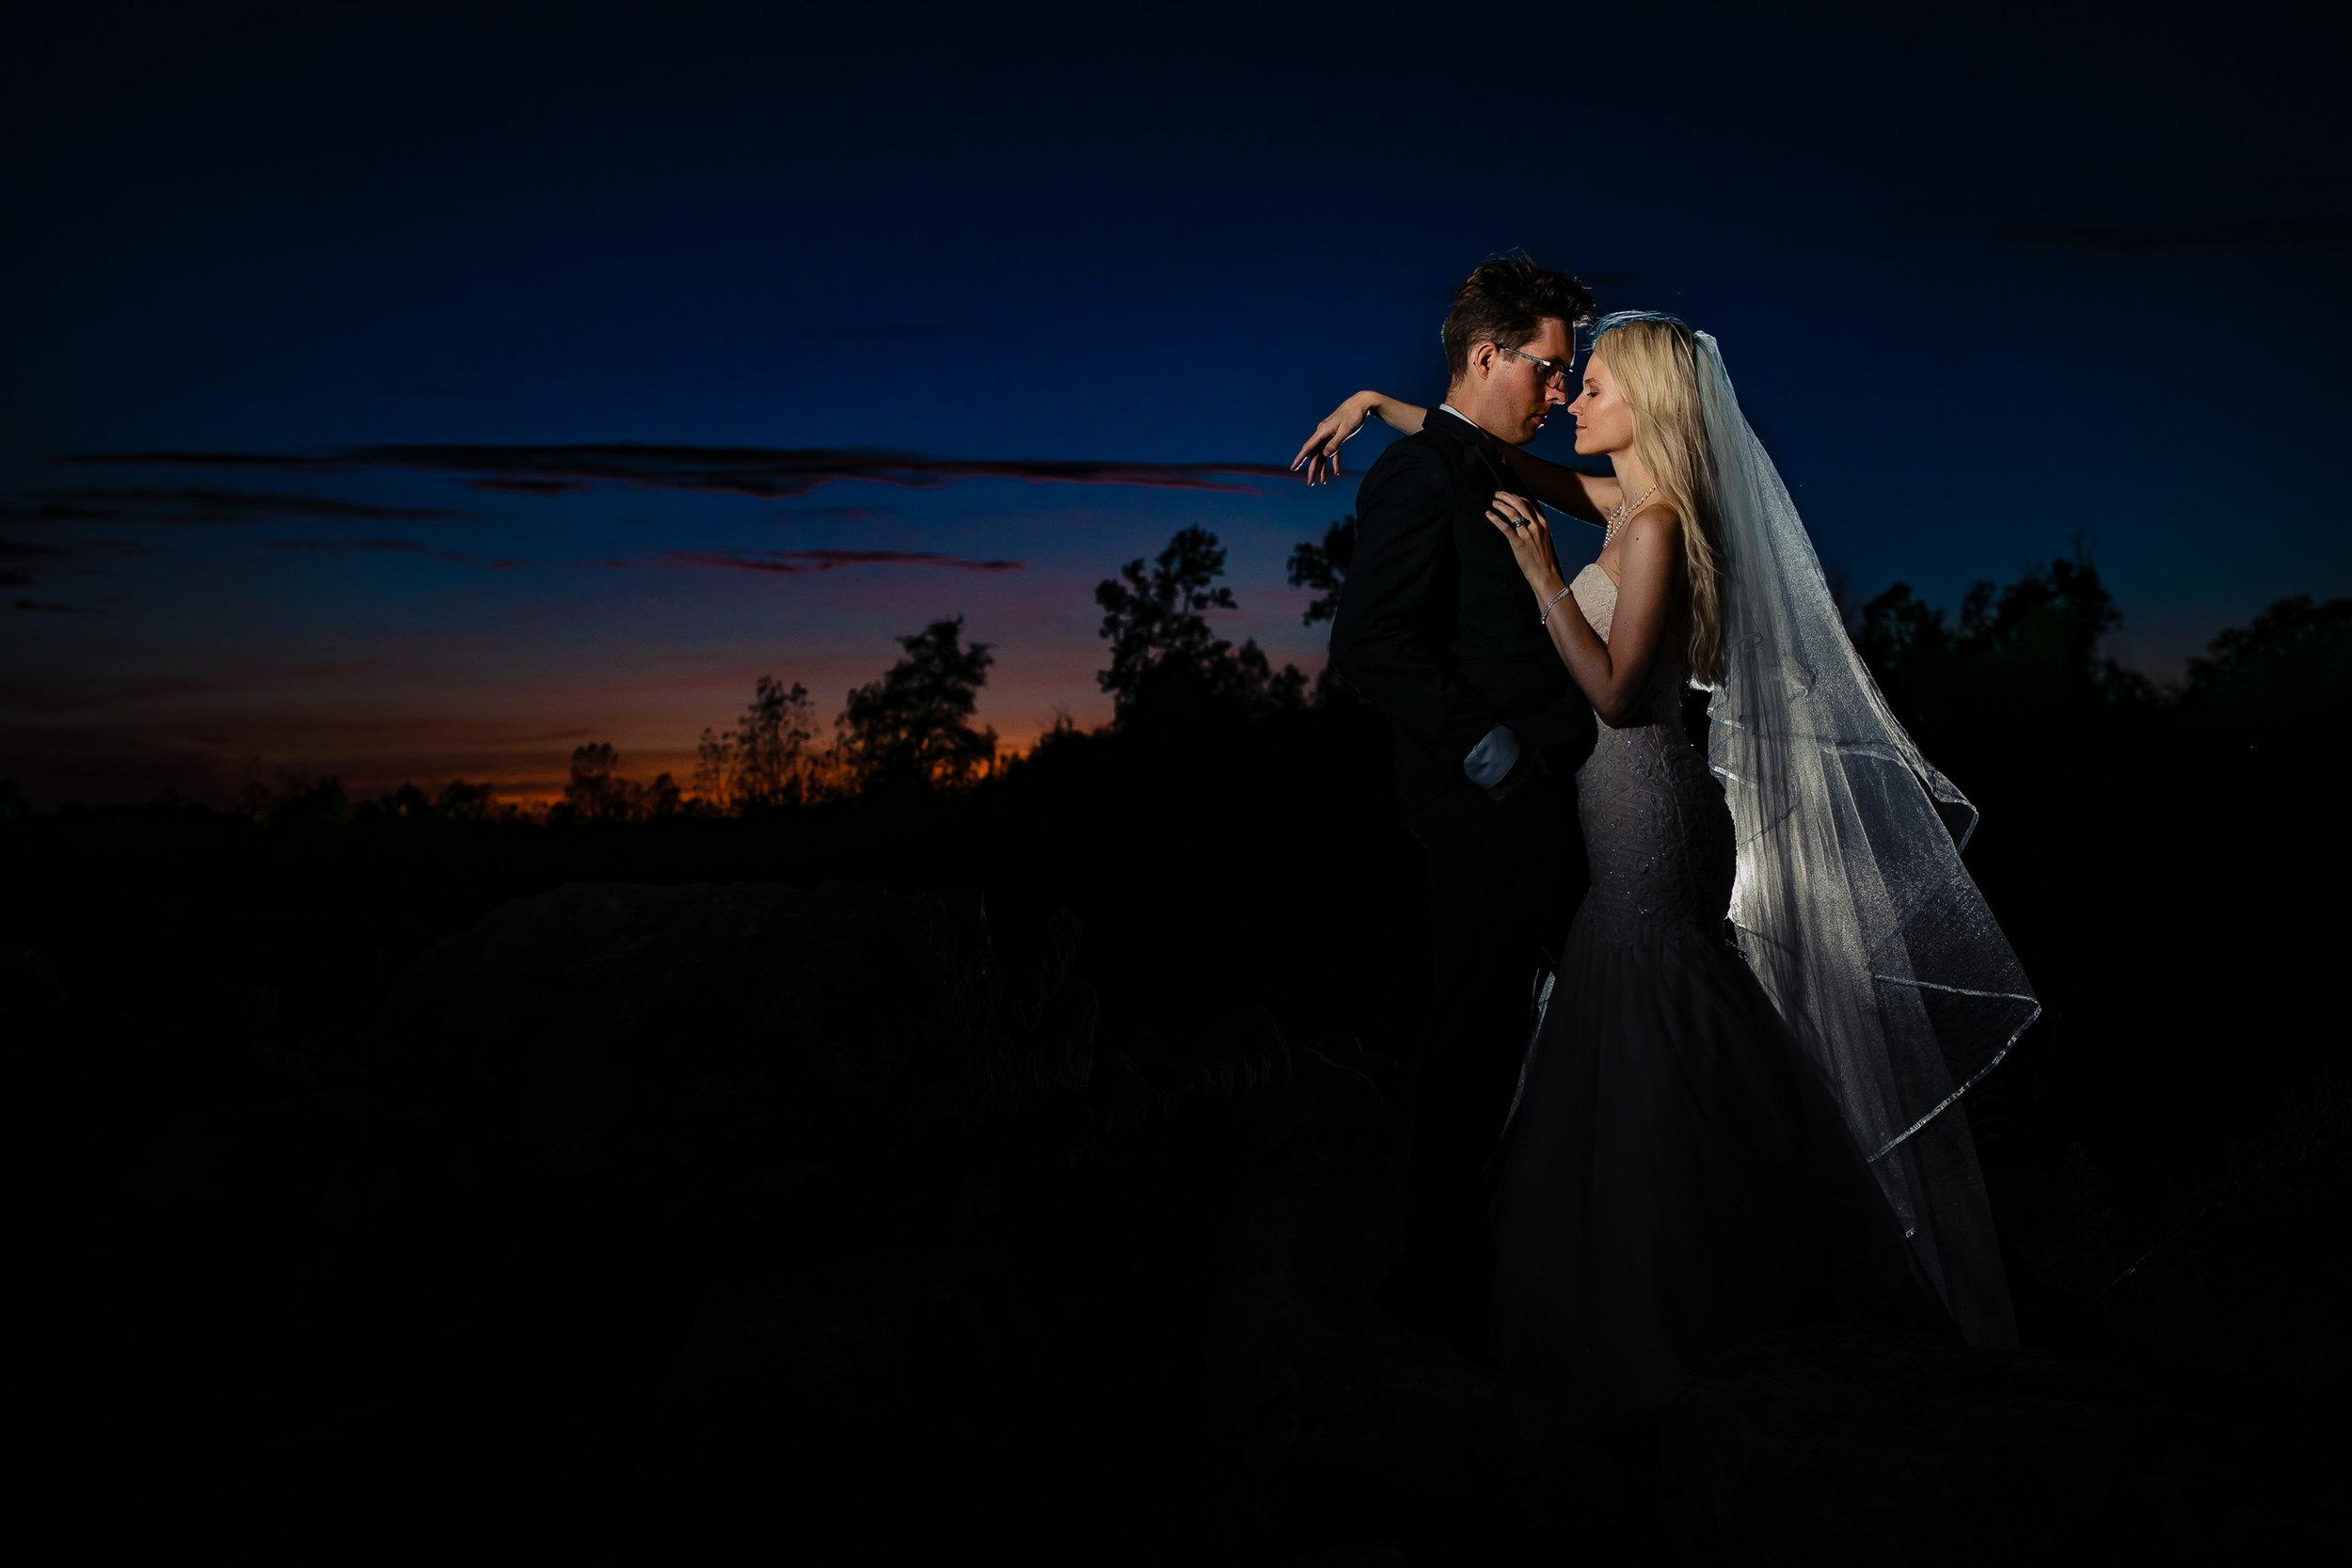 Bride and Groom Sunset Quarry-1.jpg